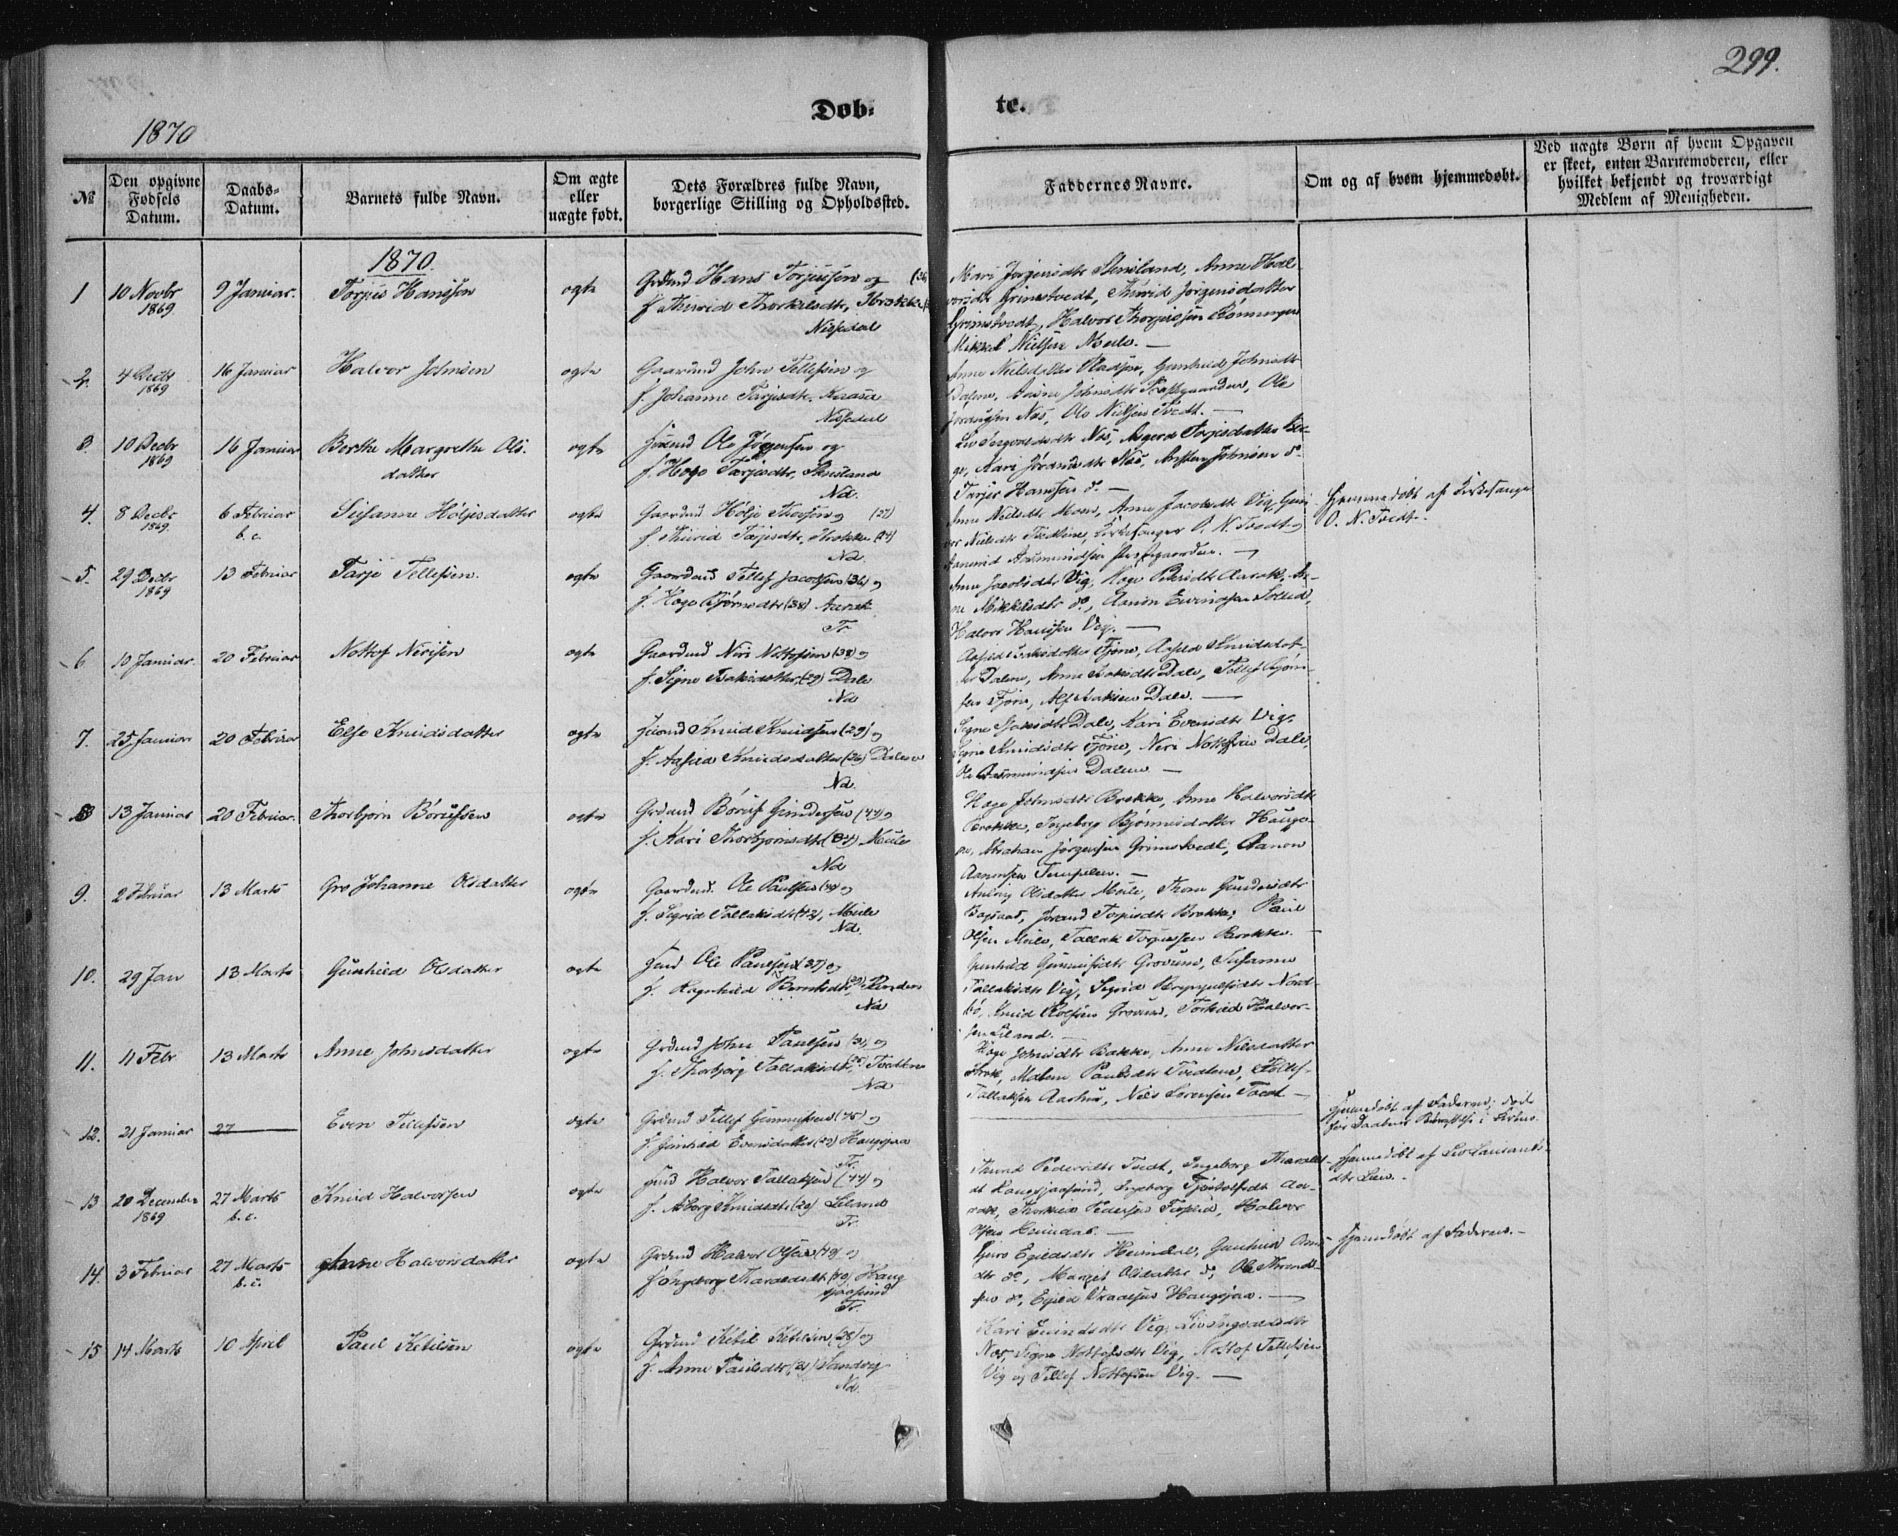 SAKO, Nissedal kirkebøker, F/Fa/L0003: Ministerialbok nr. I 3, 1846-1870, s. 298-299